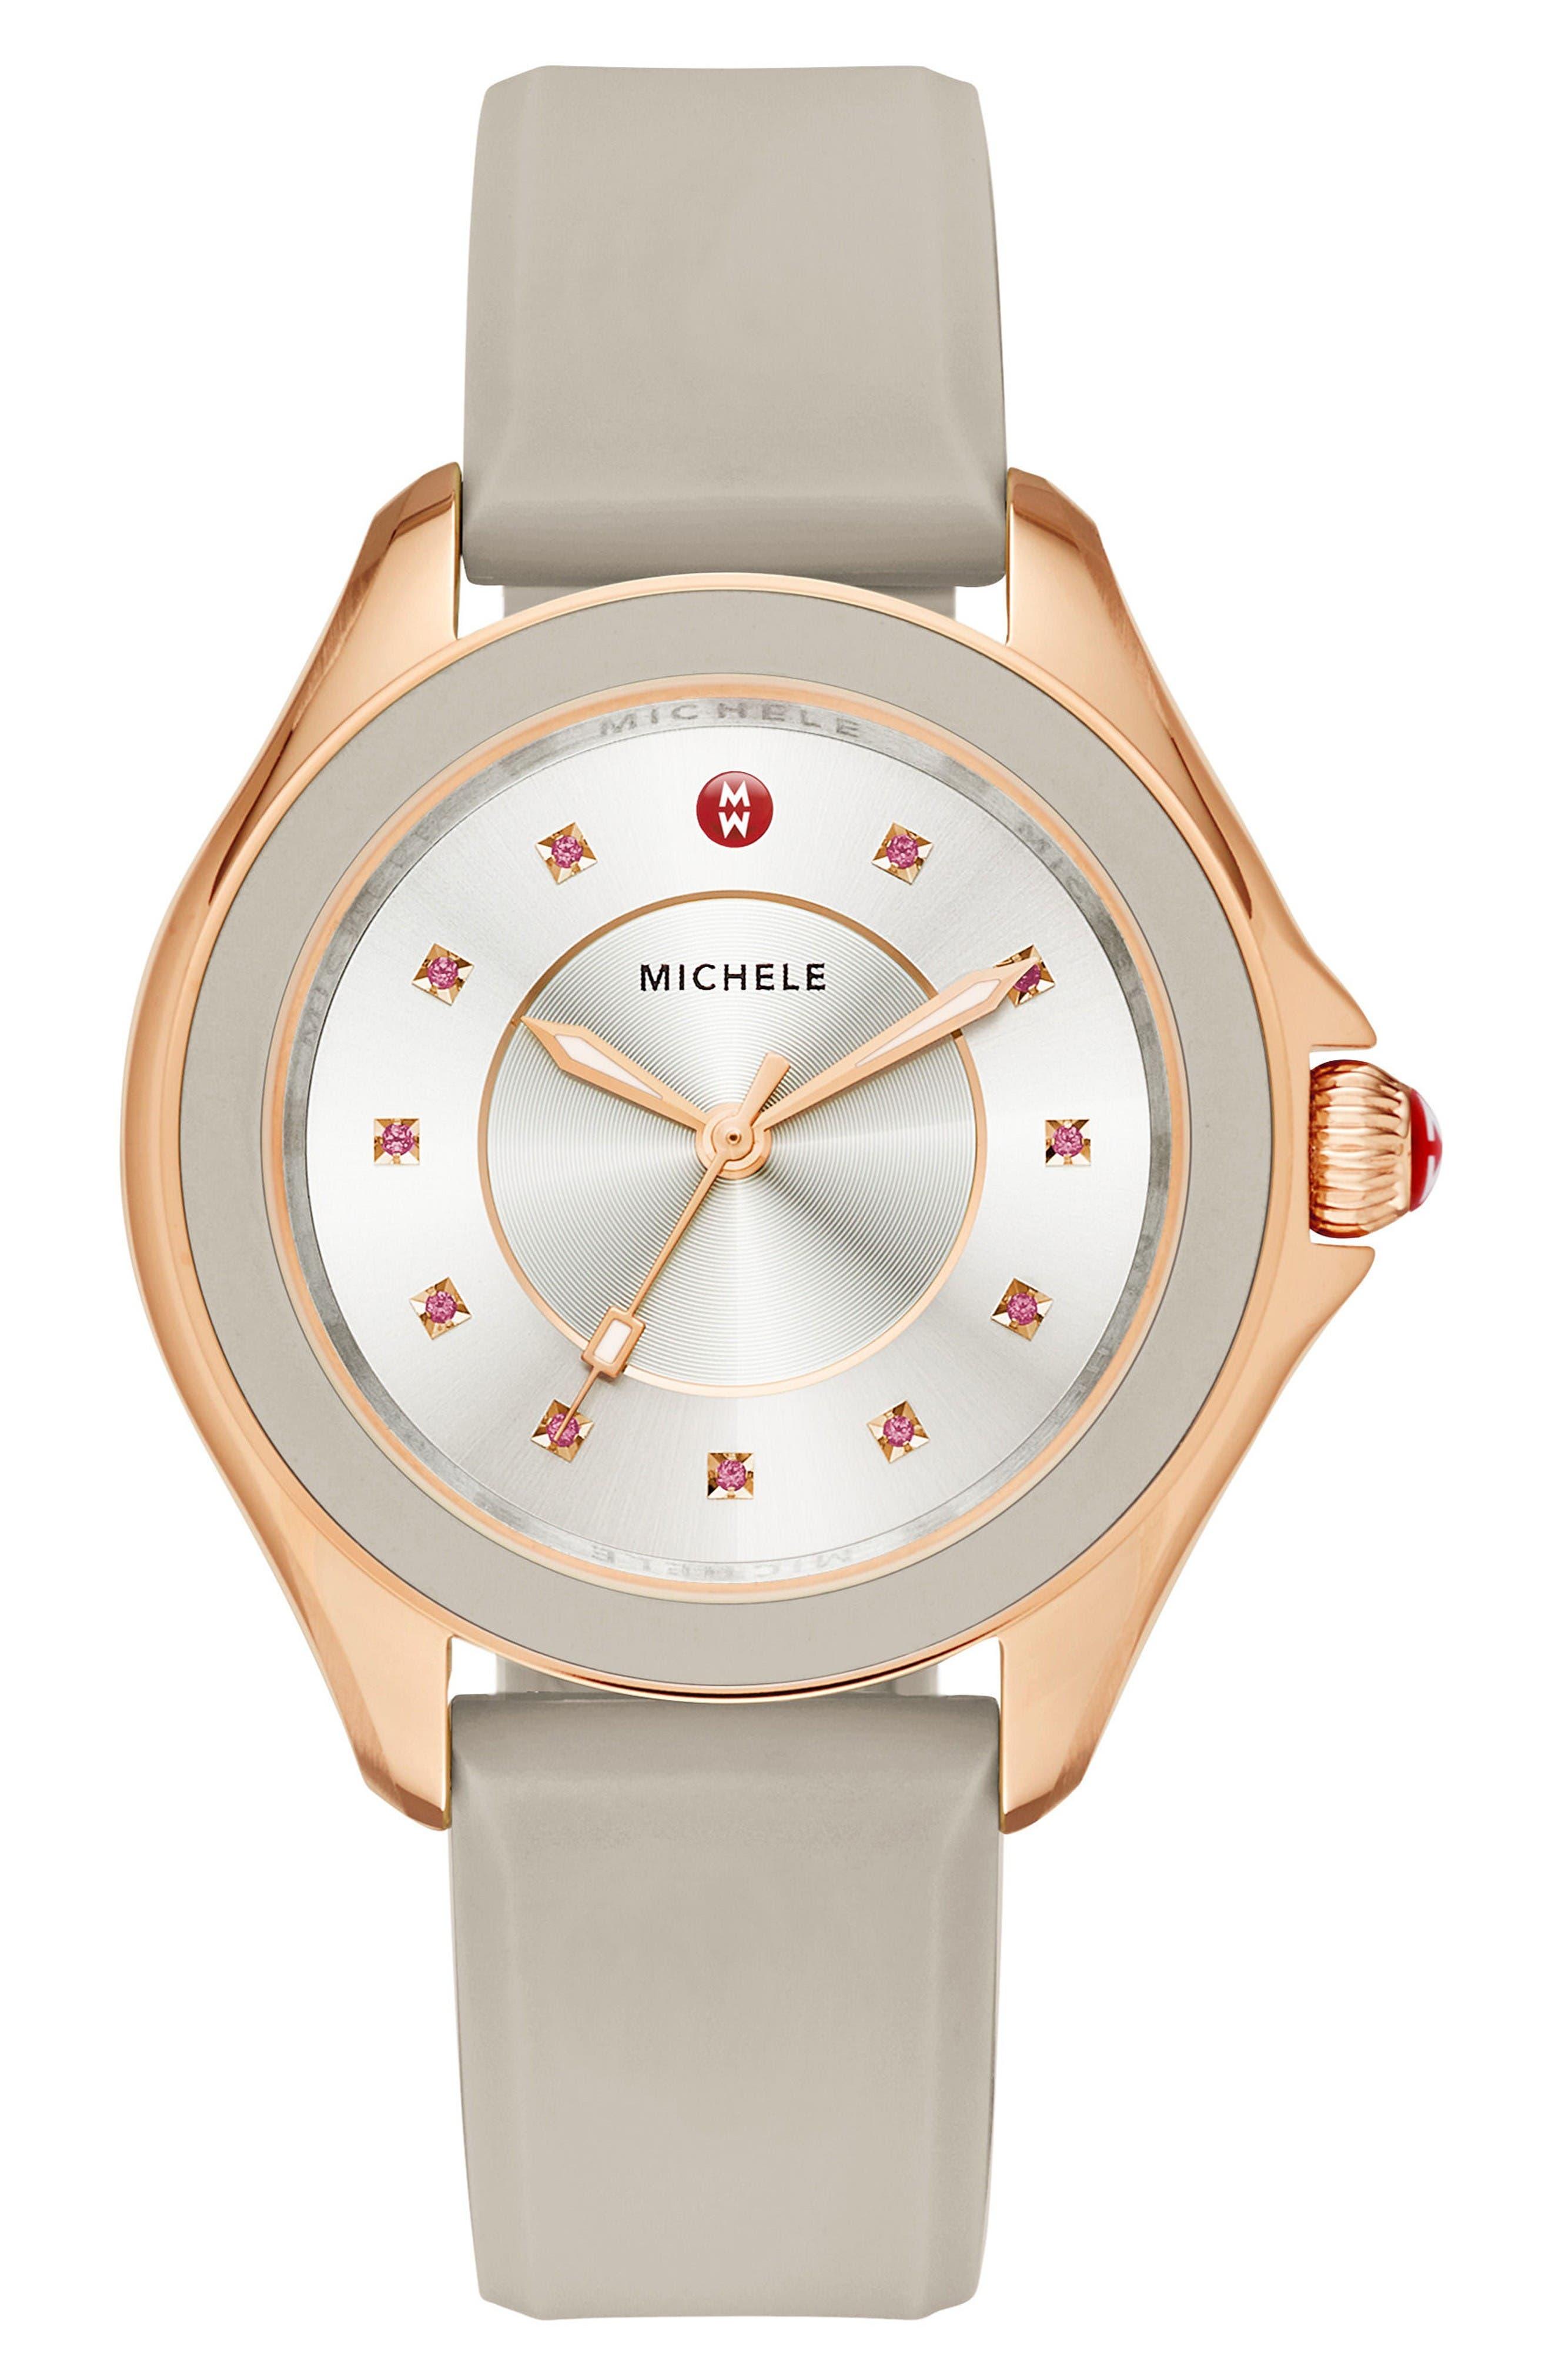 MICHELE Cape Topaz Dial Silicone Strap Watch, 36mm